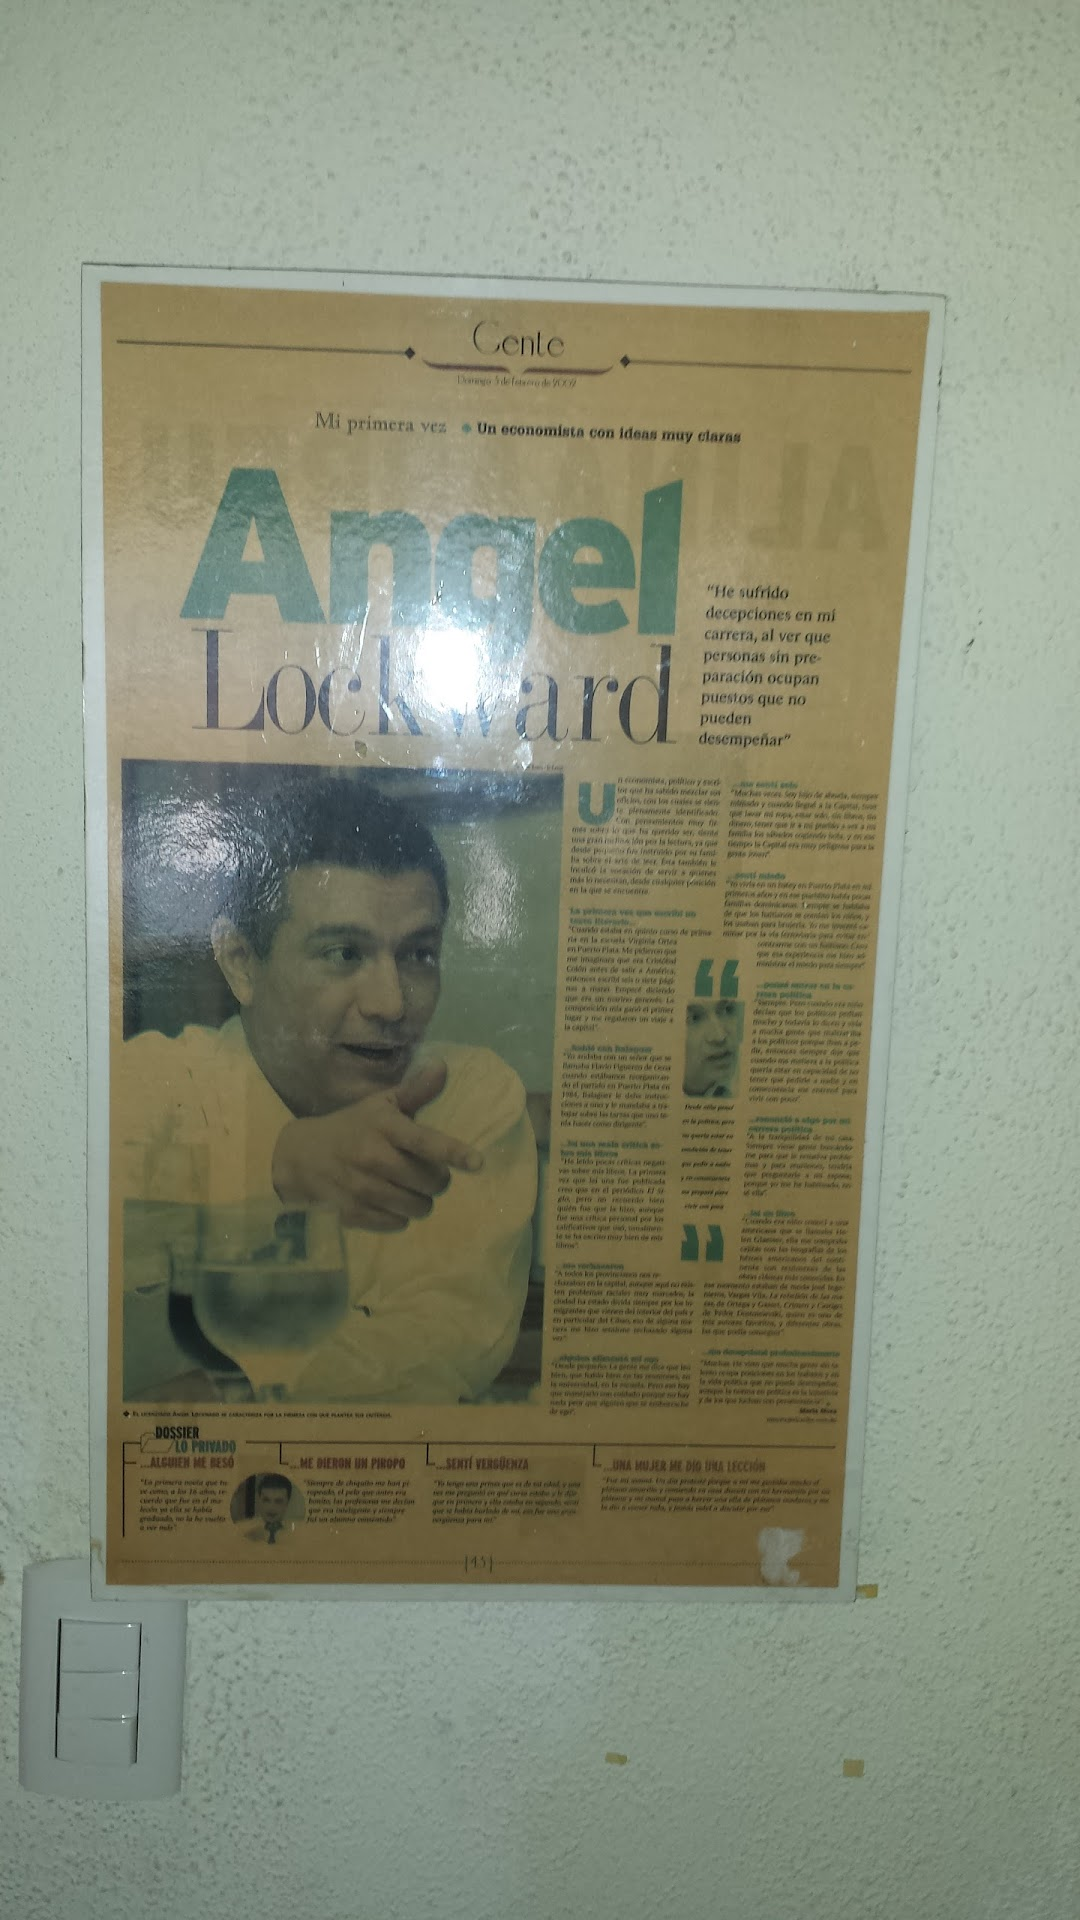 Angel Lockward & Asociados